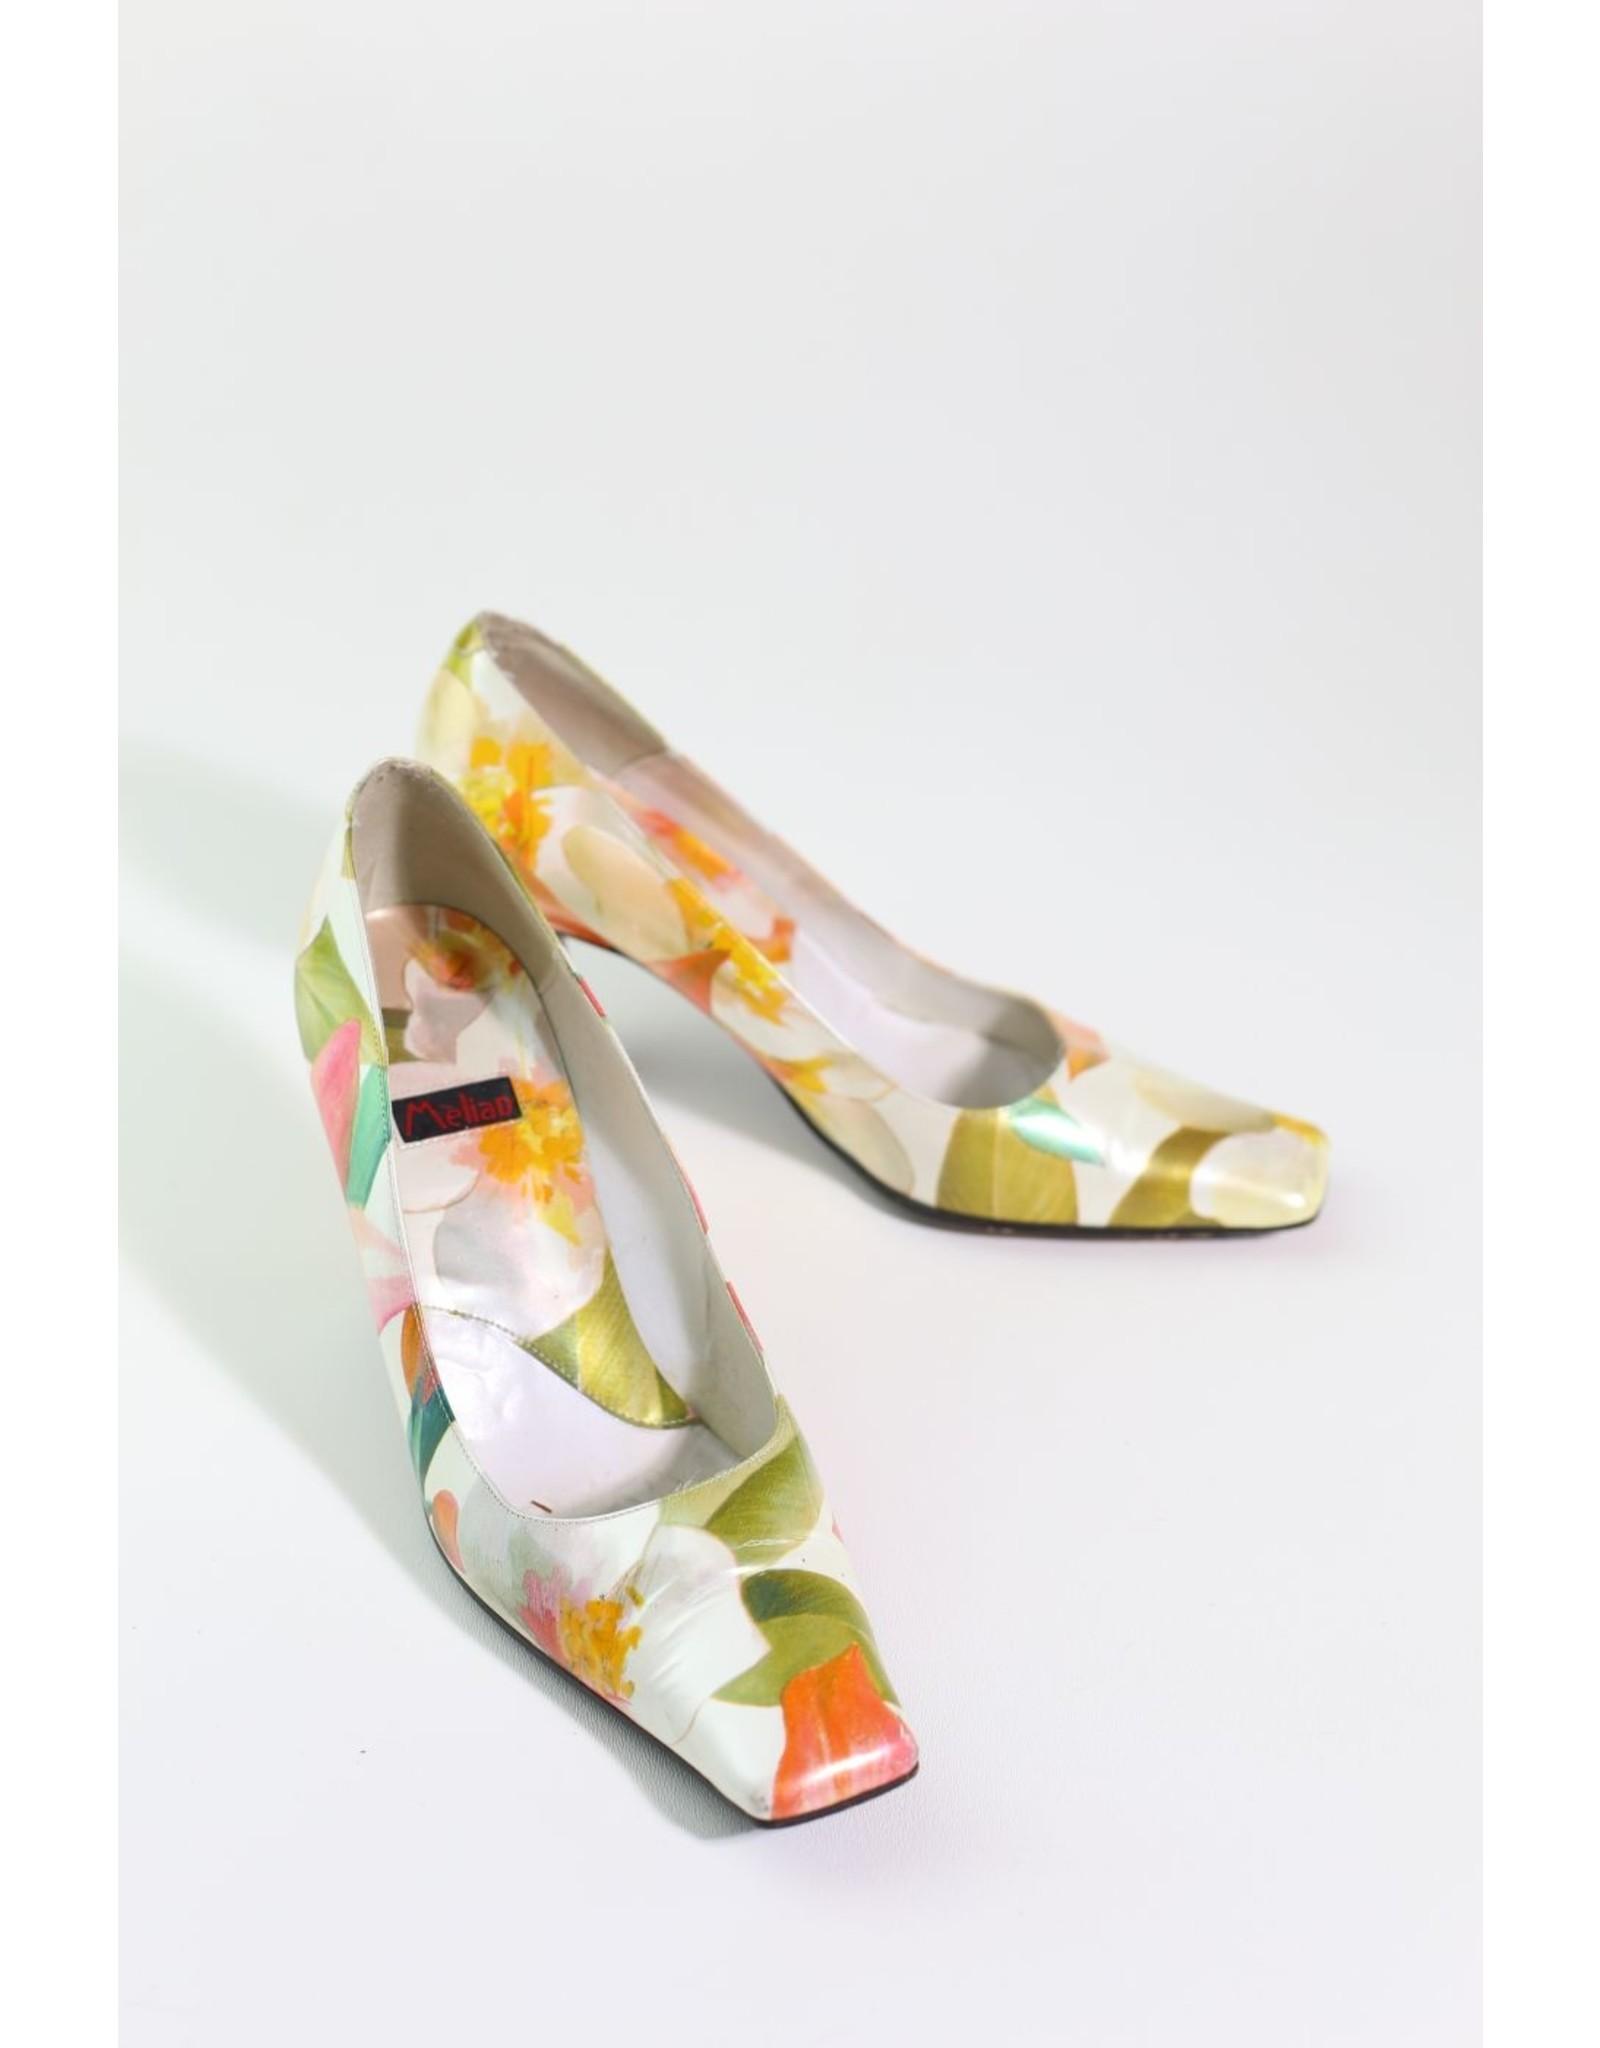 1960's Floral Heels 8.5